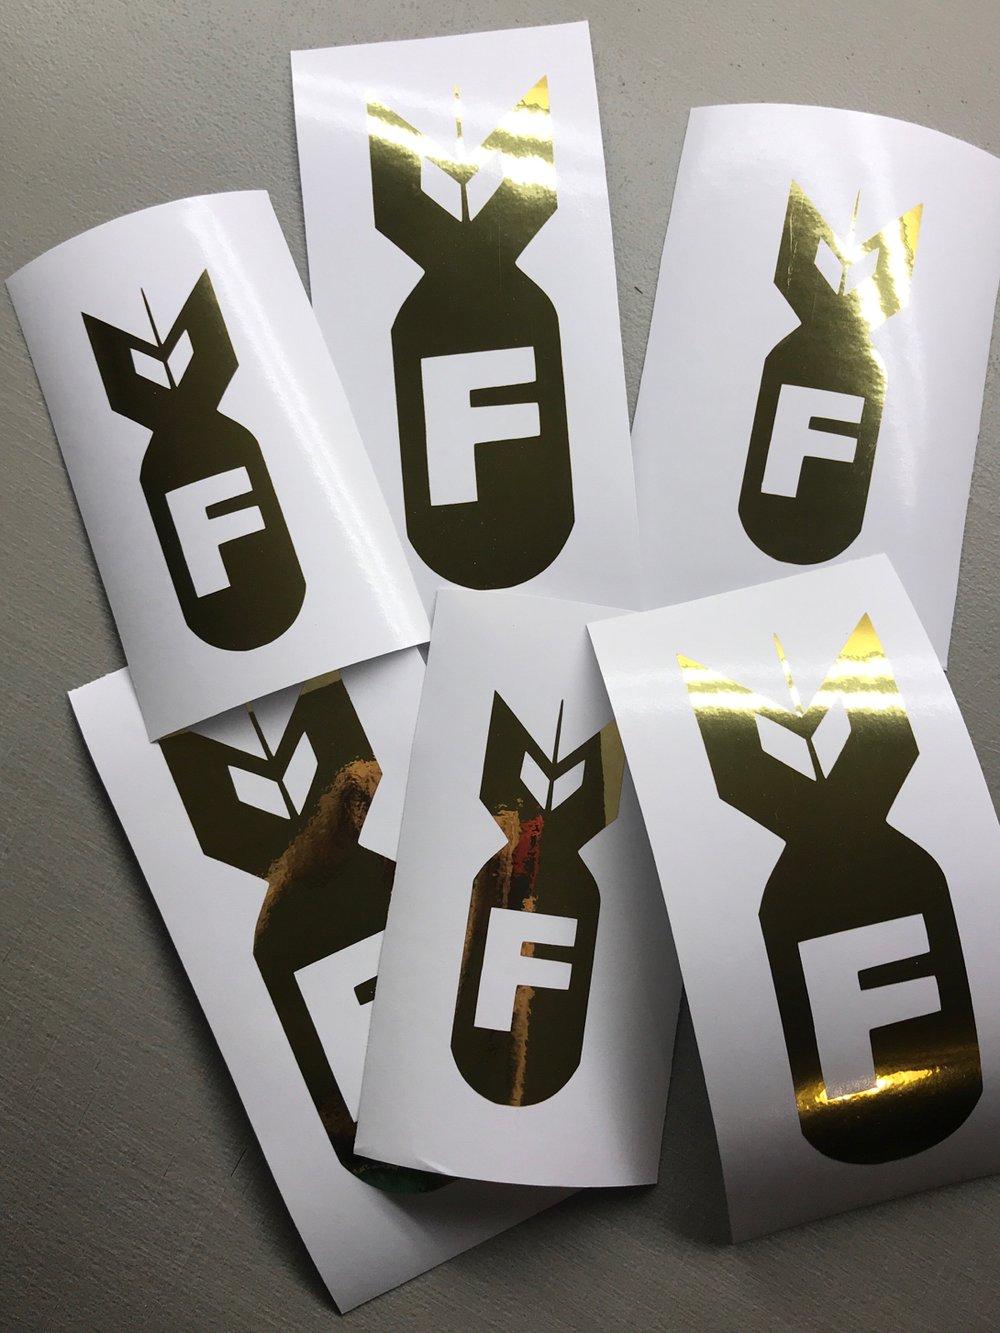 Image of F Bombs x2